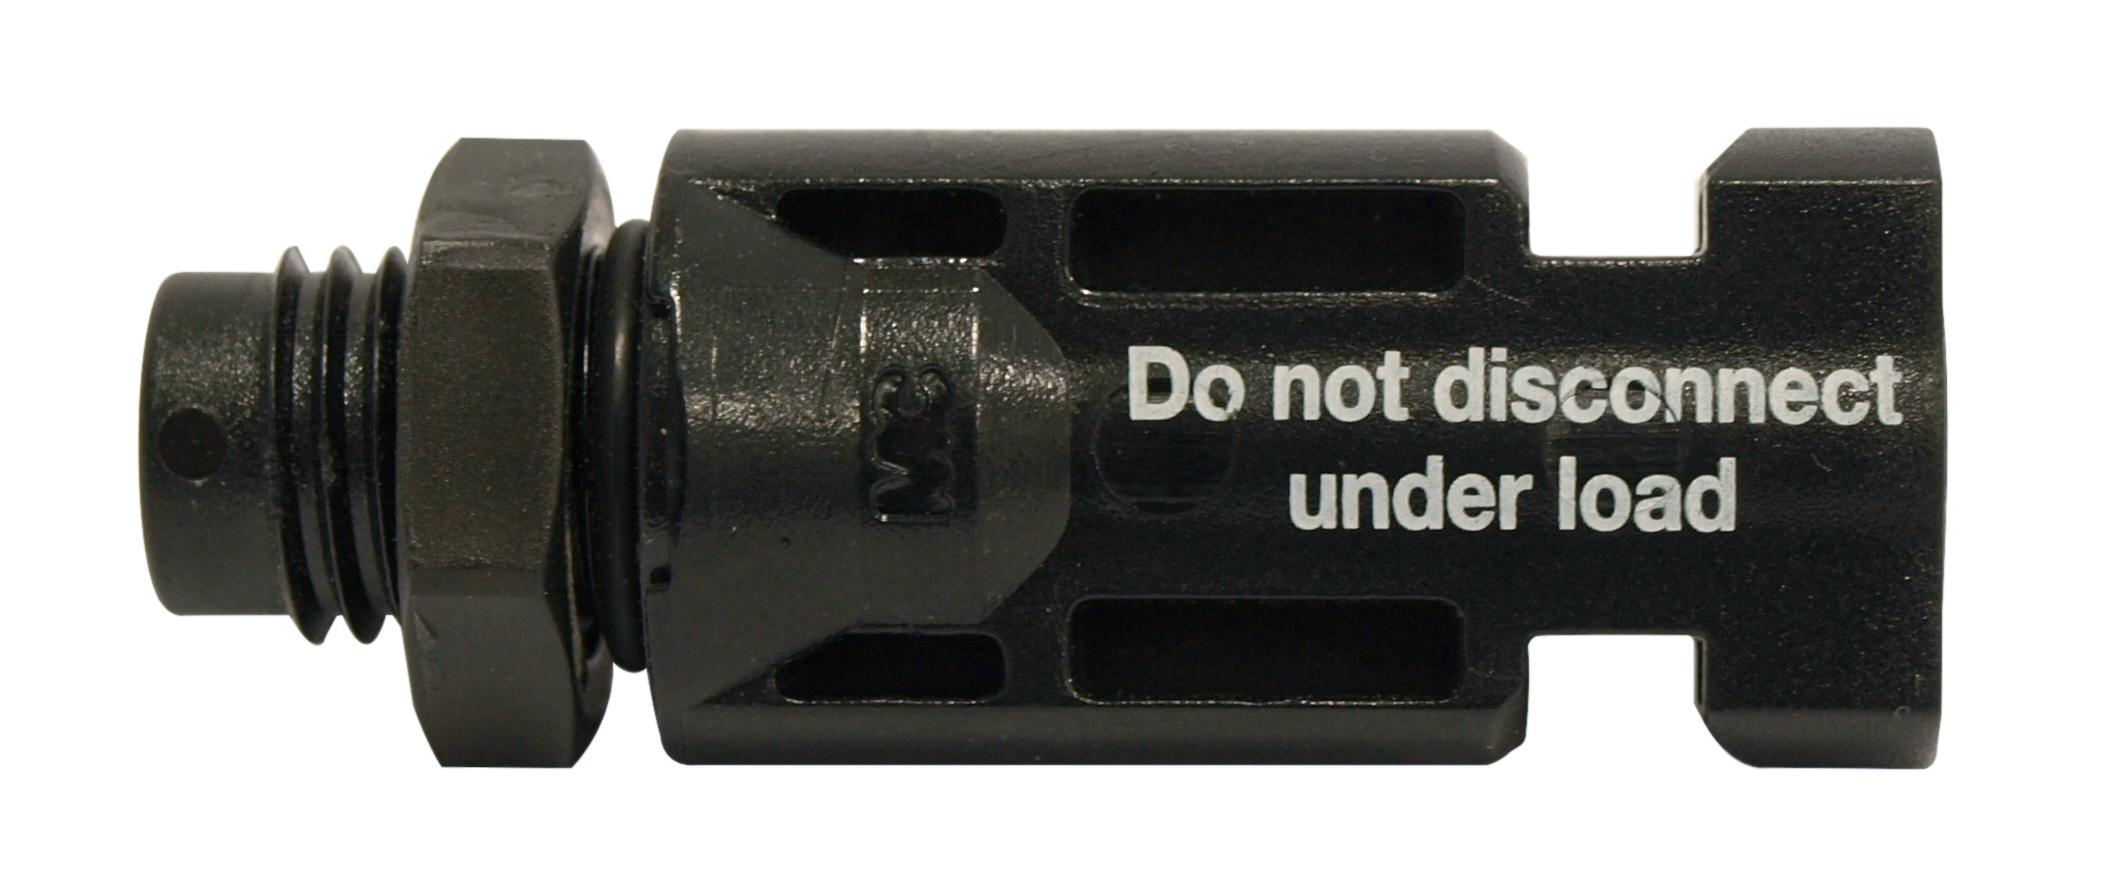 1 Stk Aufbaudosenstecker MC4, Leiterquerschnitt 4 - 6mm² PVA13000--